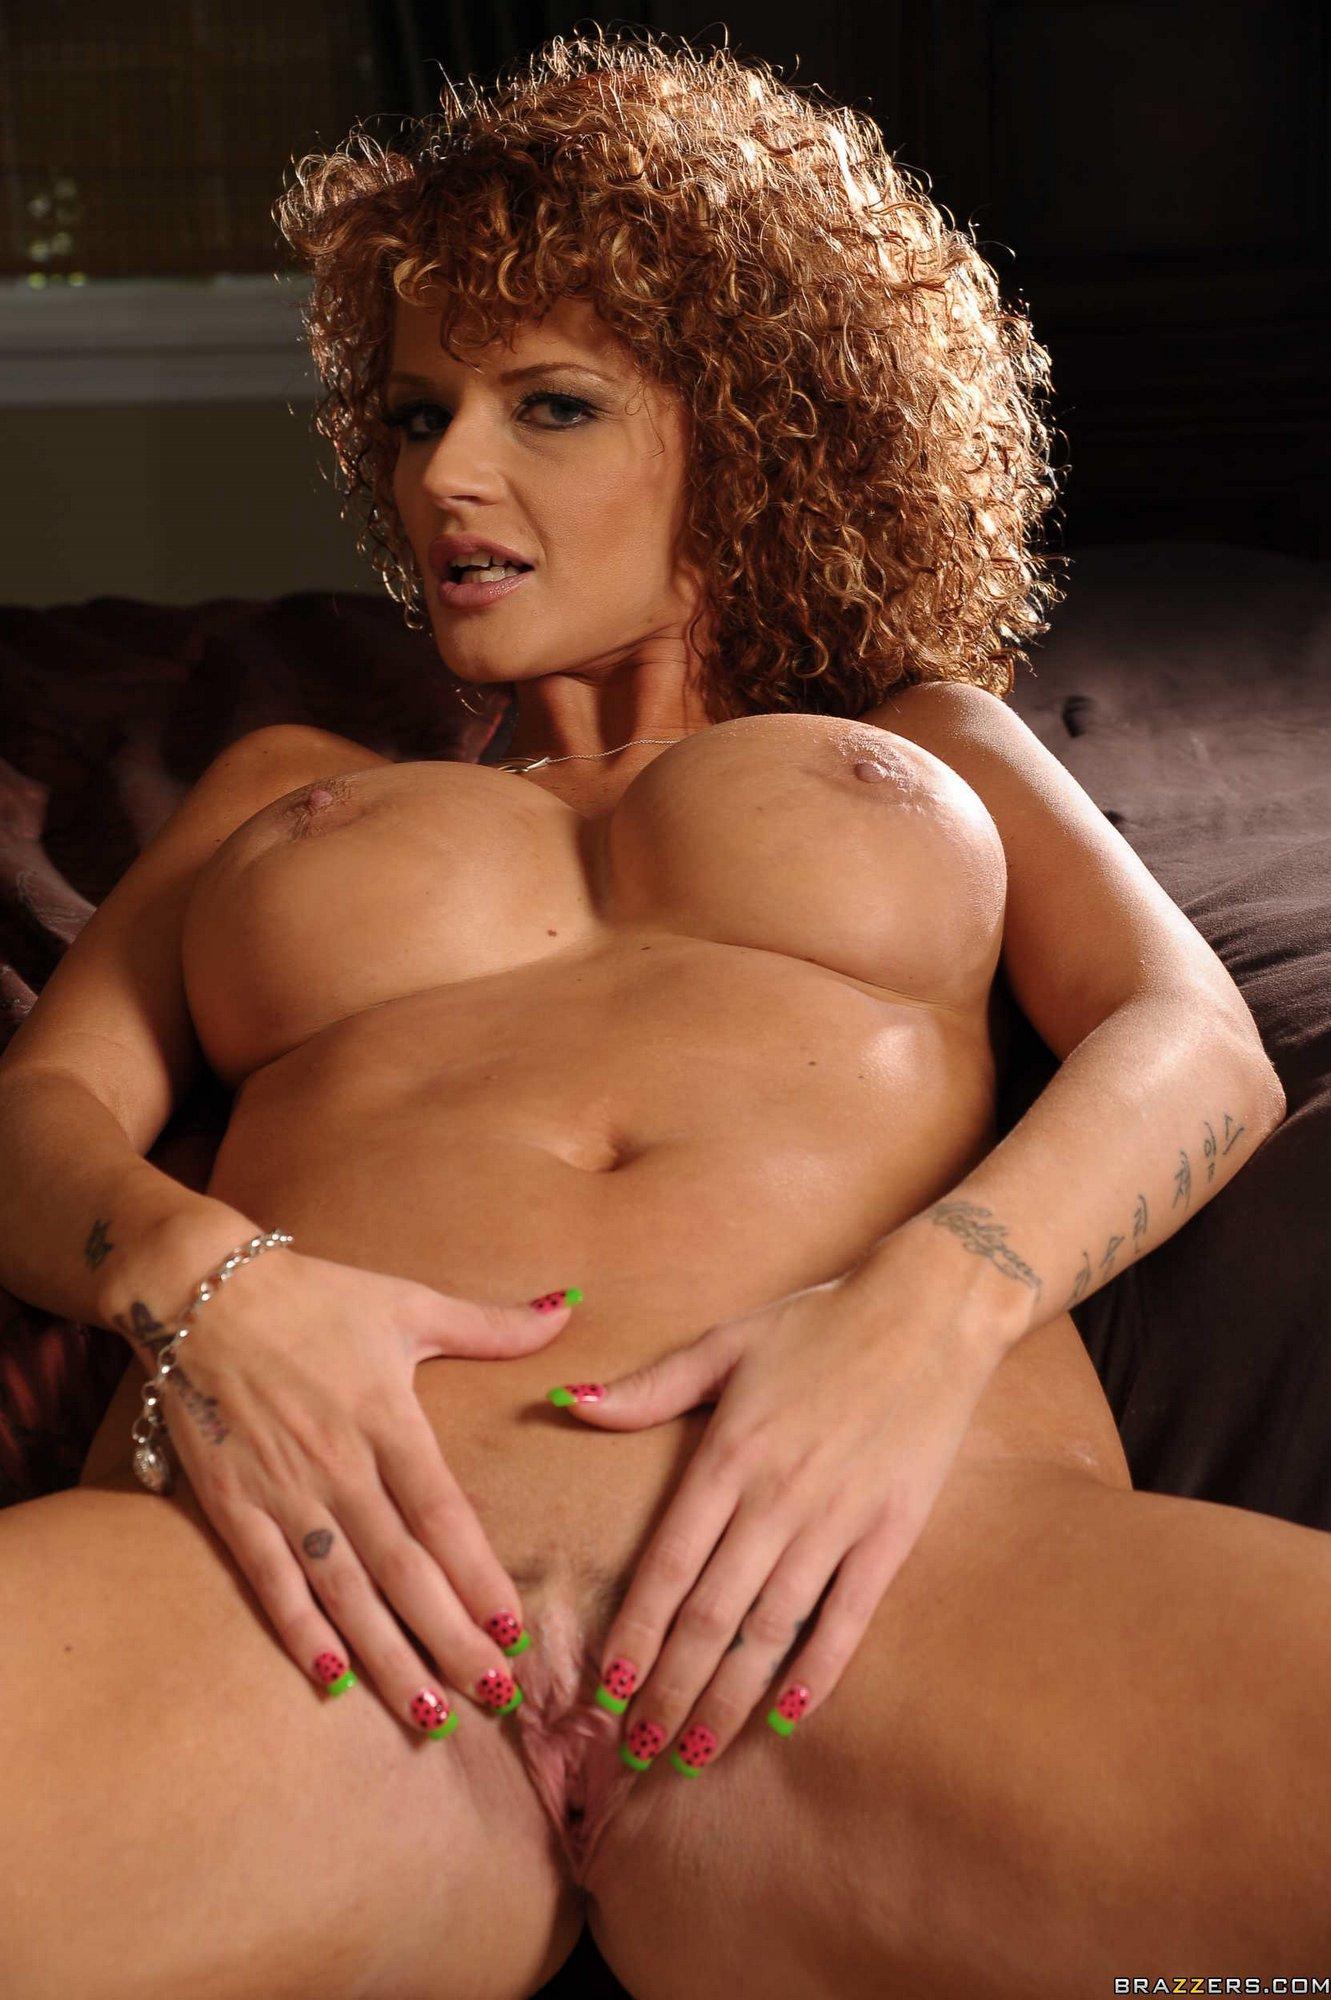 Joslyn James Posing In Sexy Underwear And Pink High Heels -2502